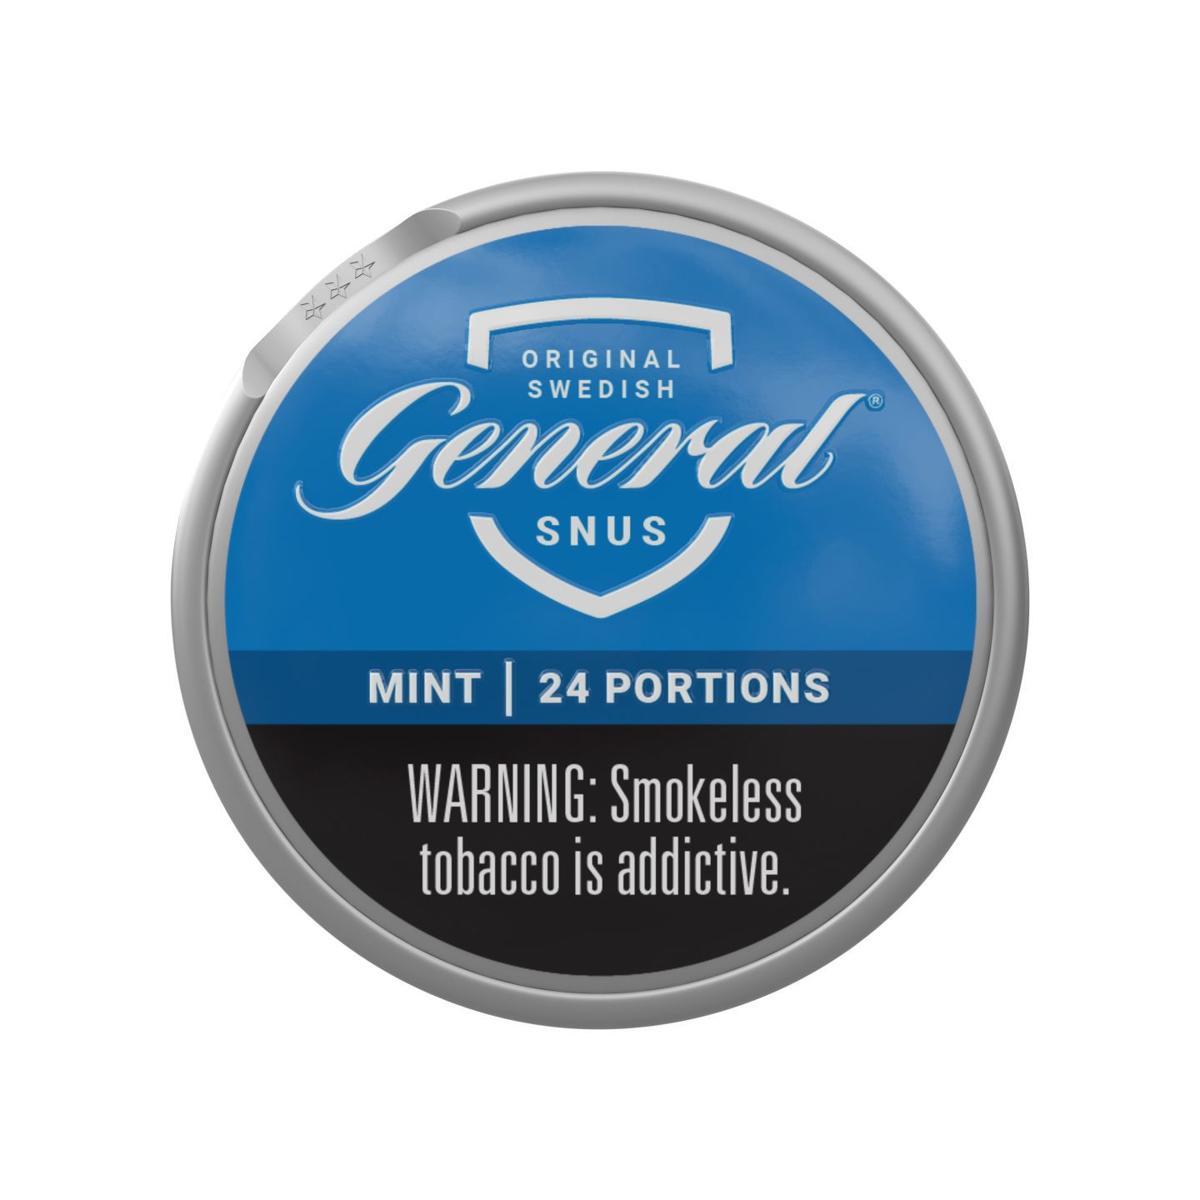 GeneralSnus-Mint-Straight